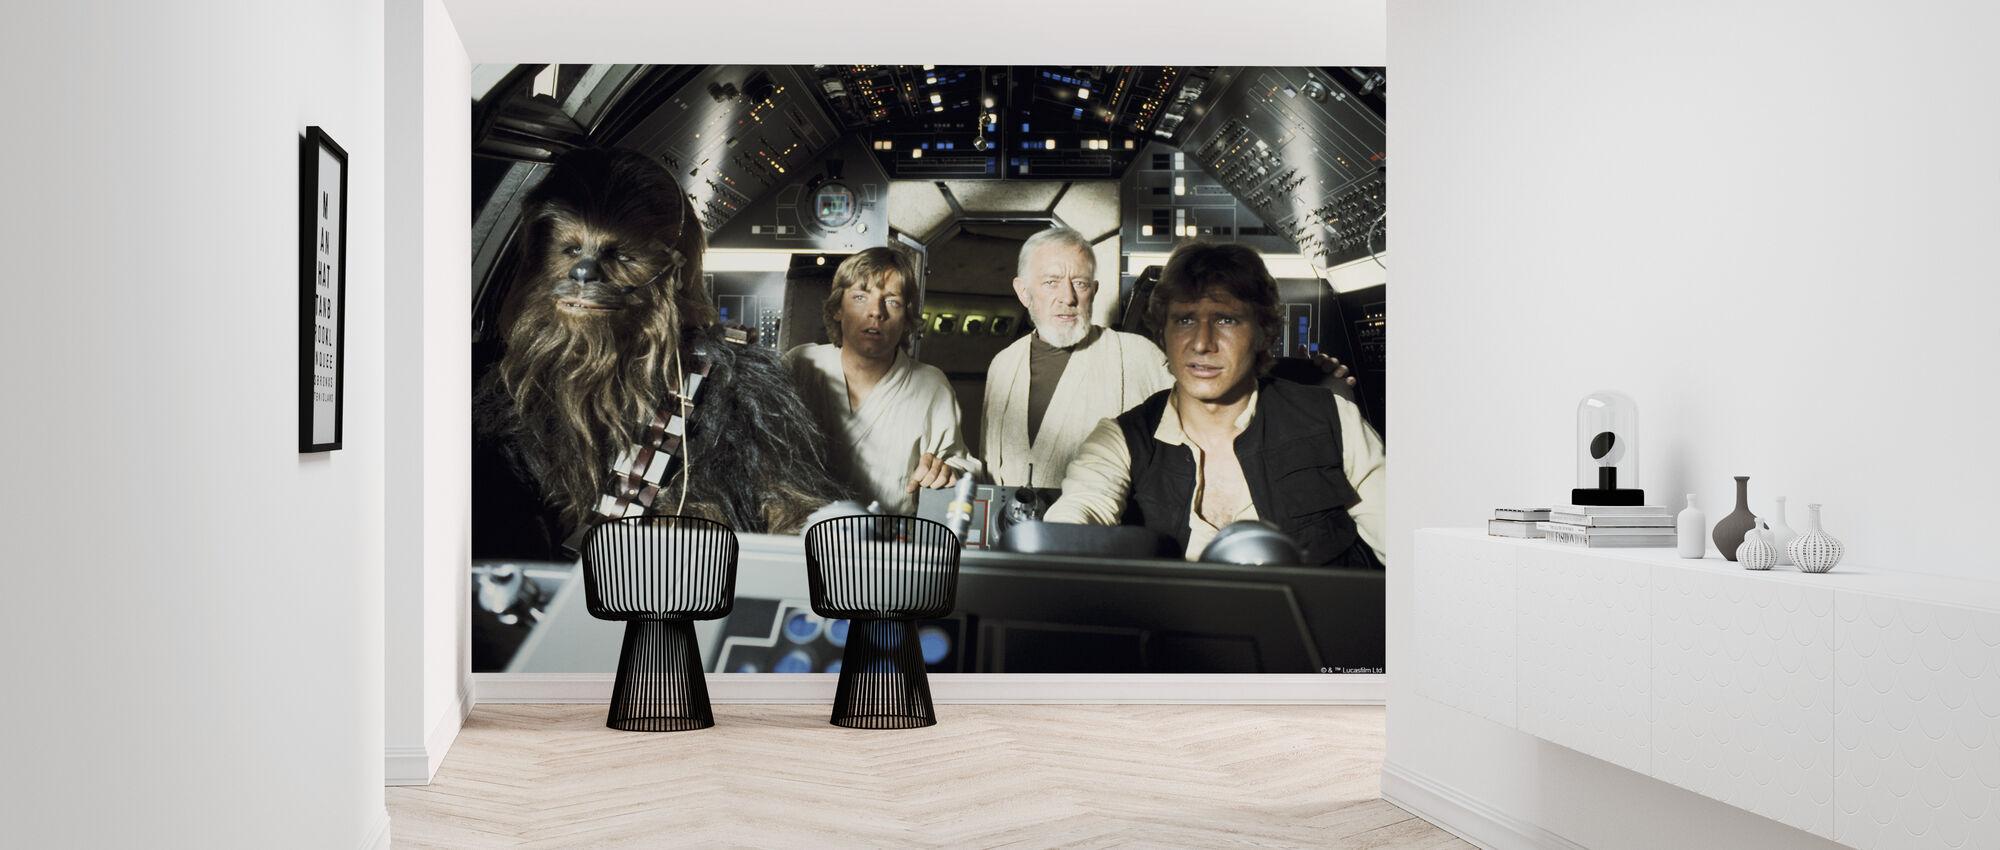 Star Wars - Millennium Falcon Luke Skywalker - Tapet - Entré